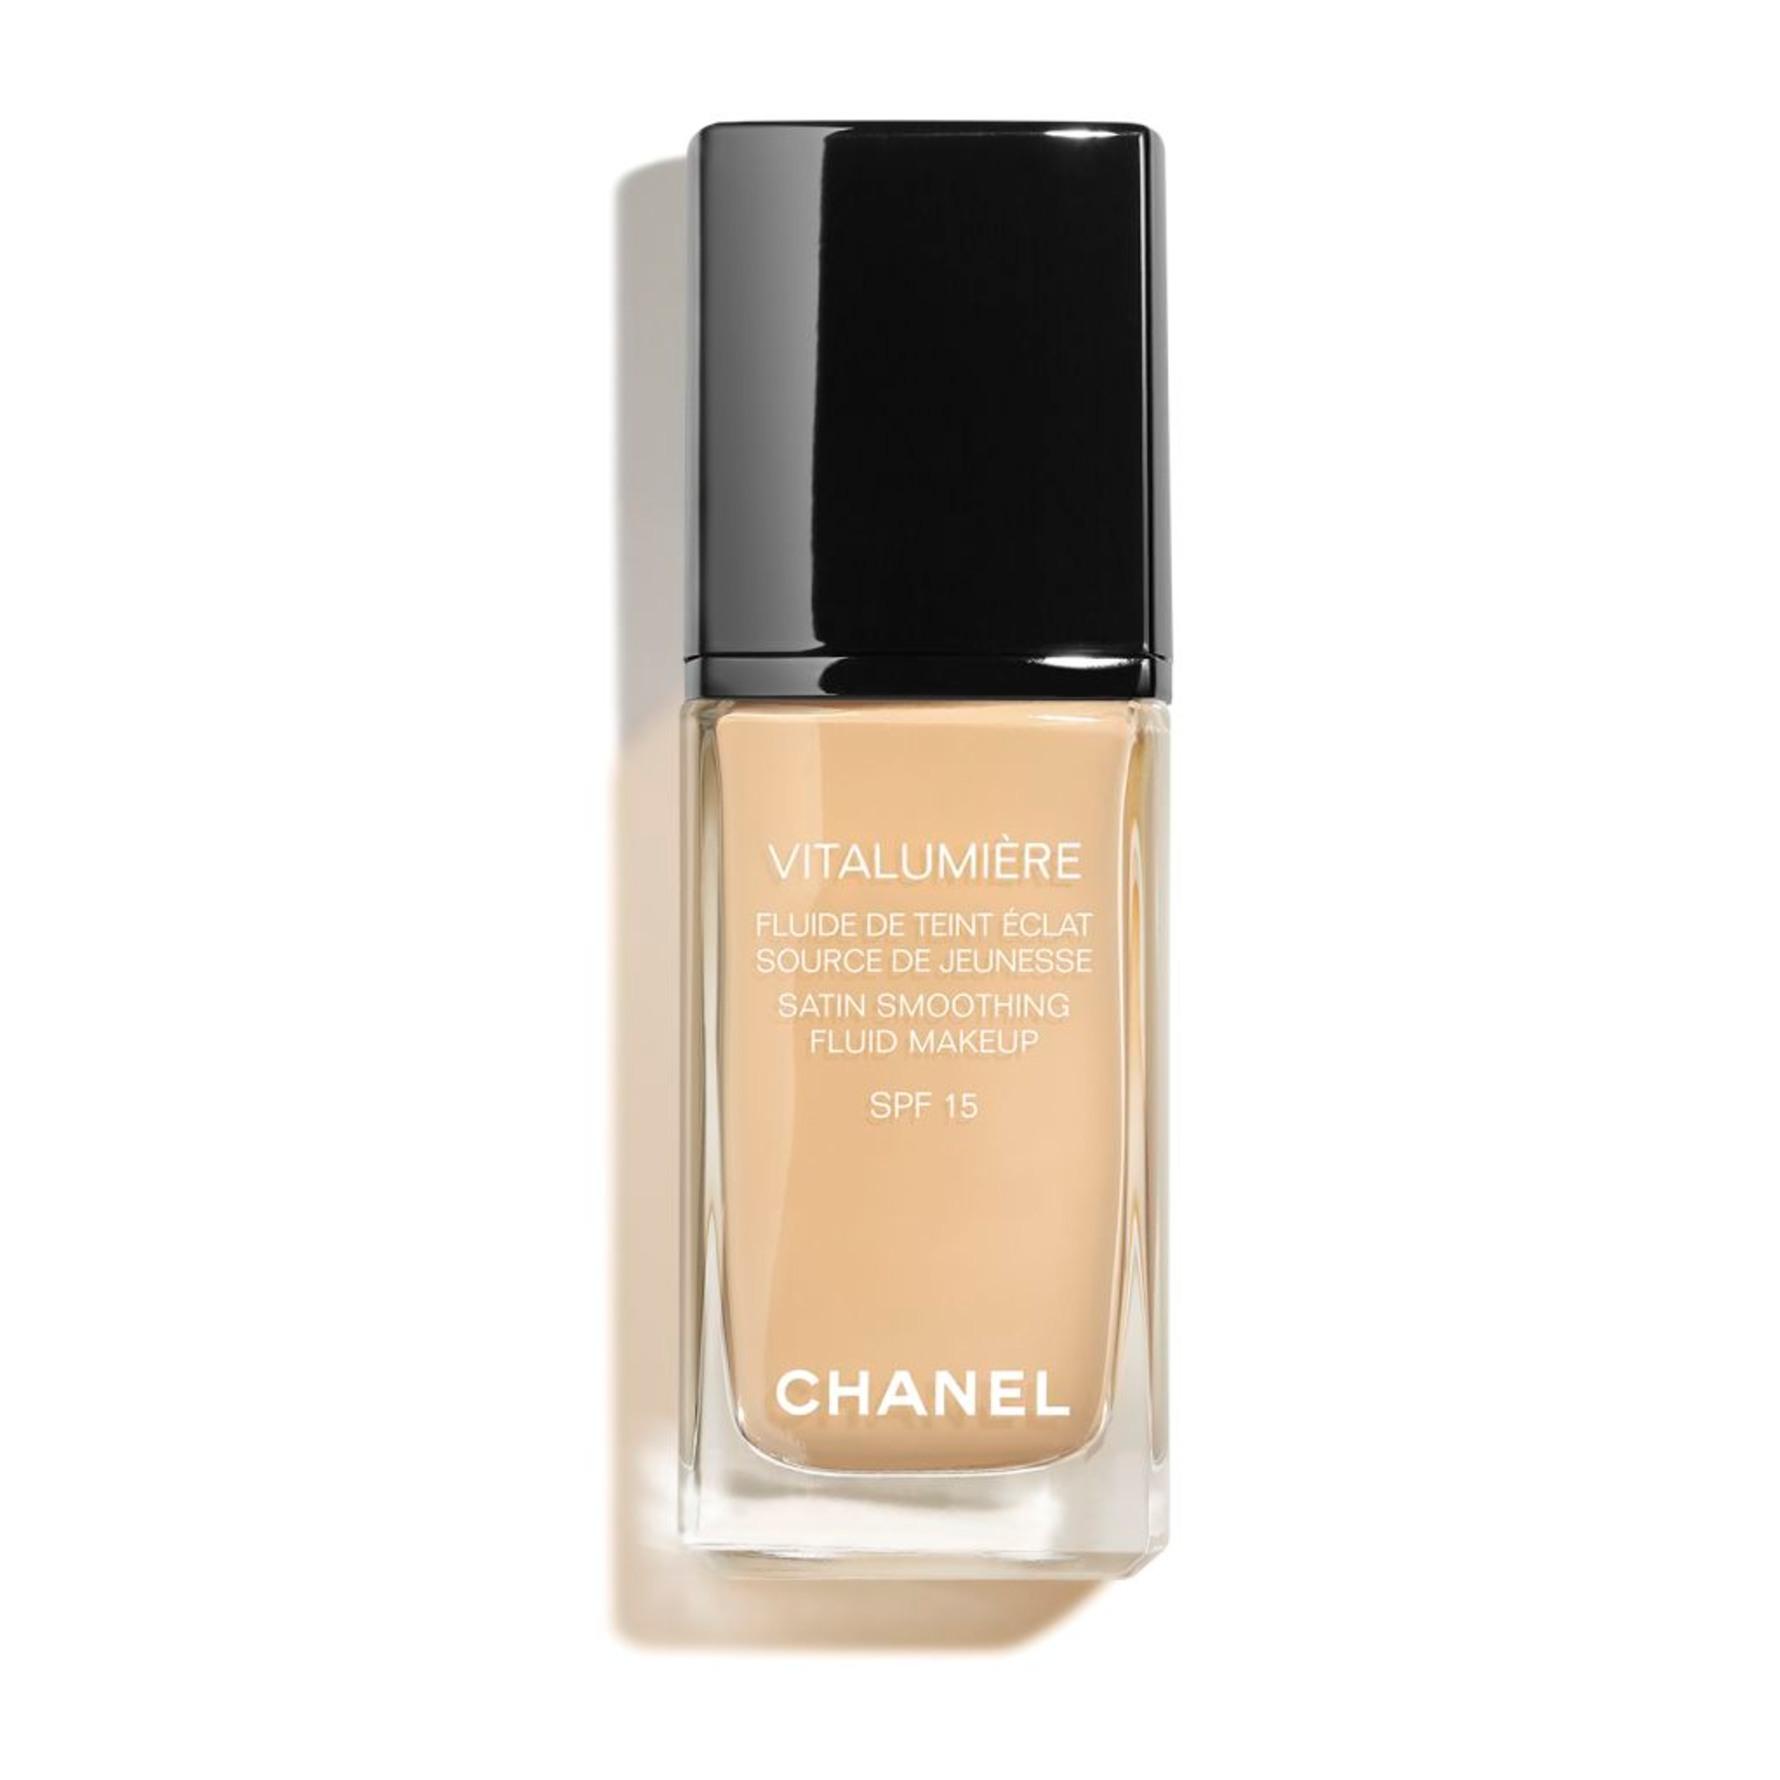 Fondo de maquillaje con protección solar Vitalumière de Chanel